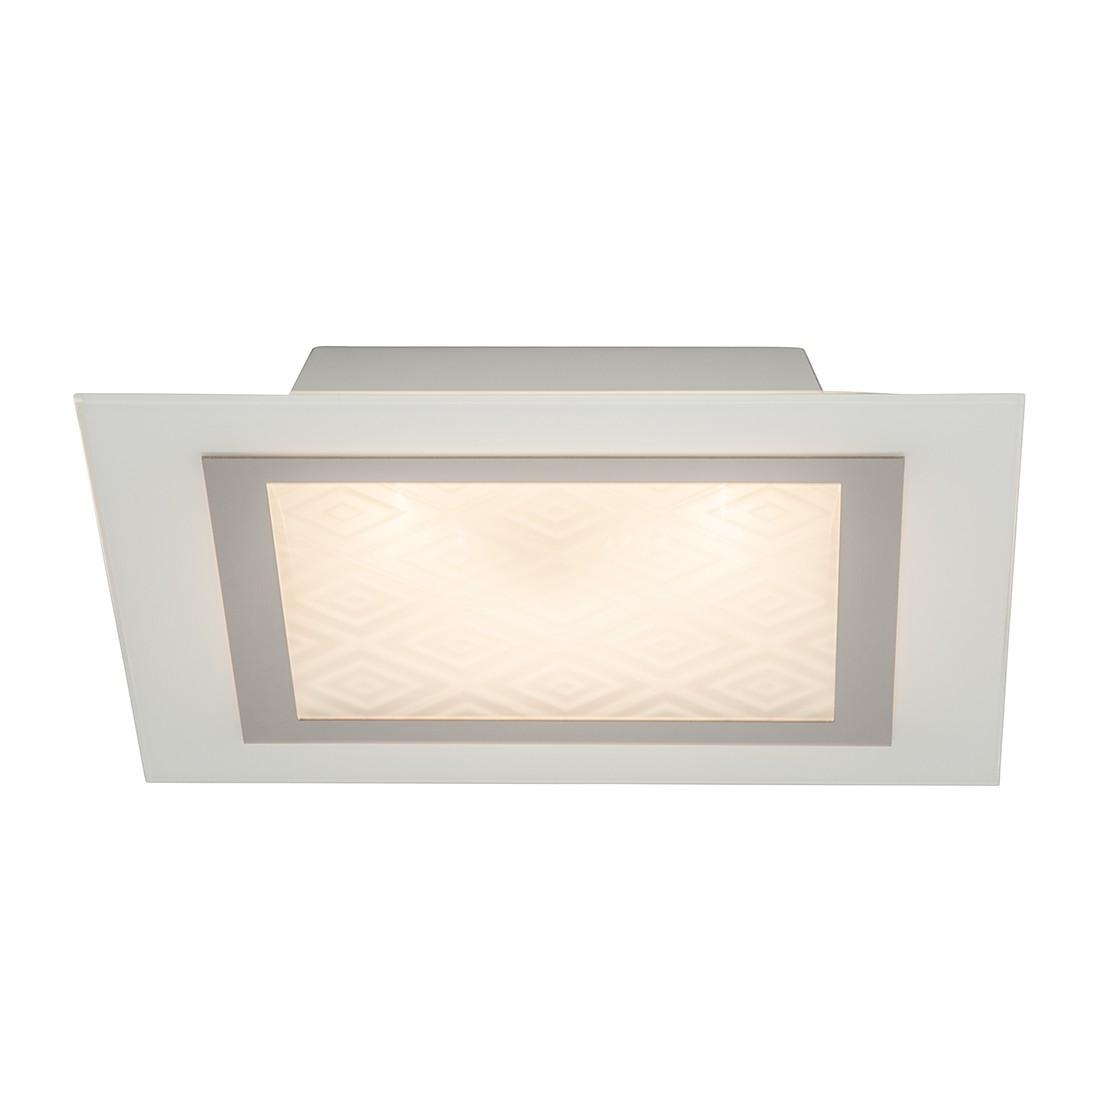 energie  A+, Plafondlamp Rolanda - zilverkleurig metaal 1 lichtbron, Brilliant